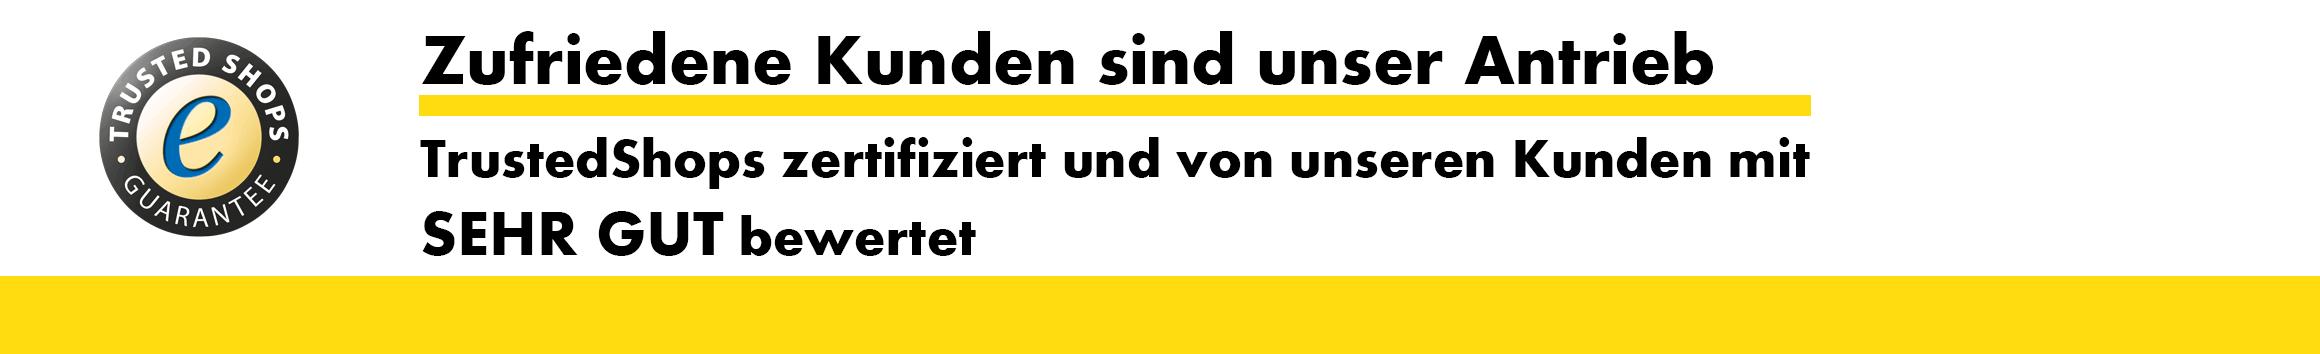 4x1-TrustedShops-Aufmacher